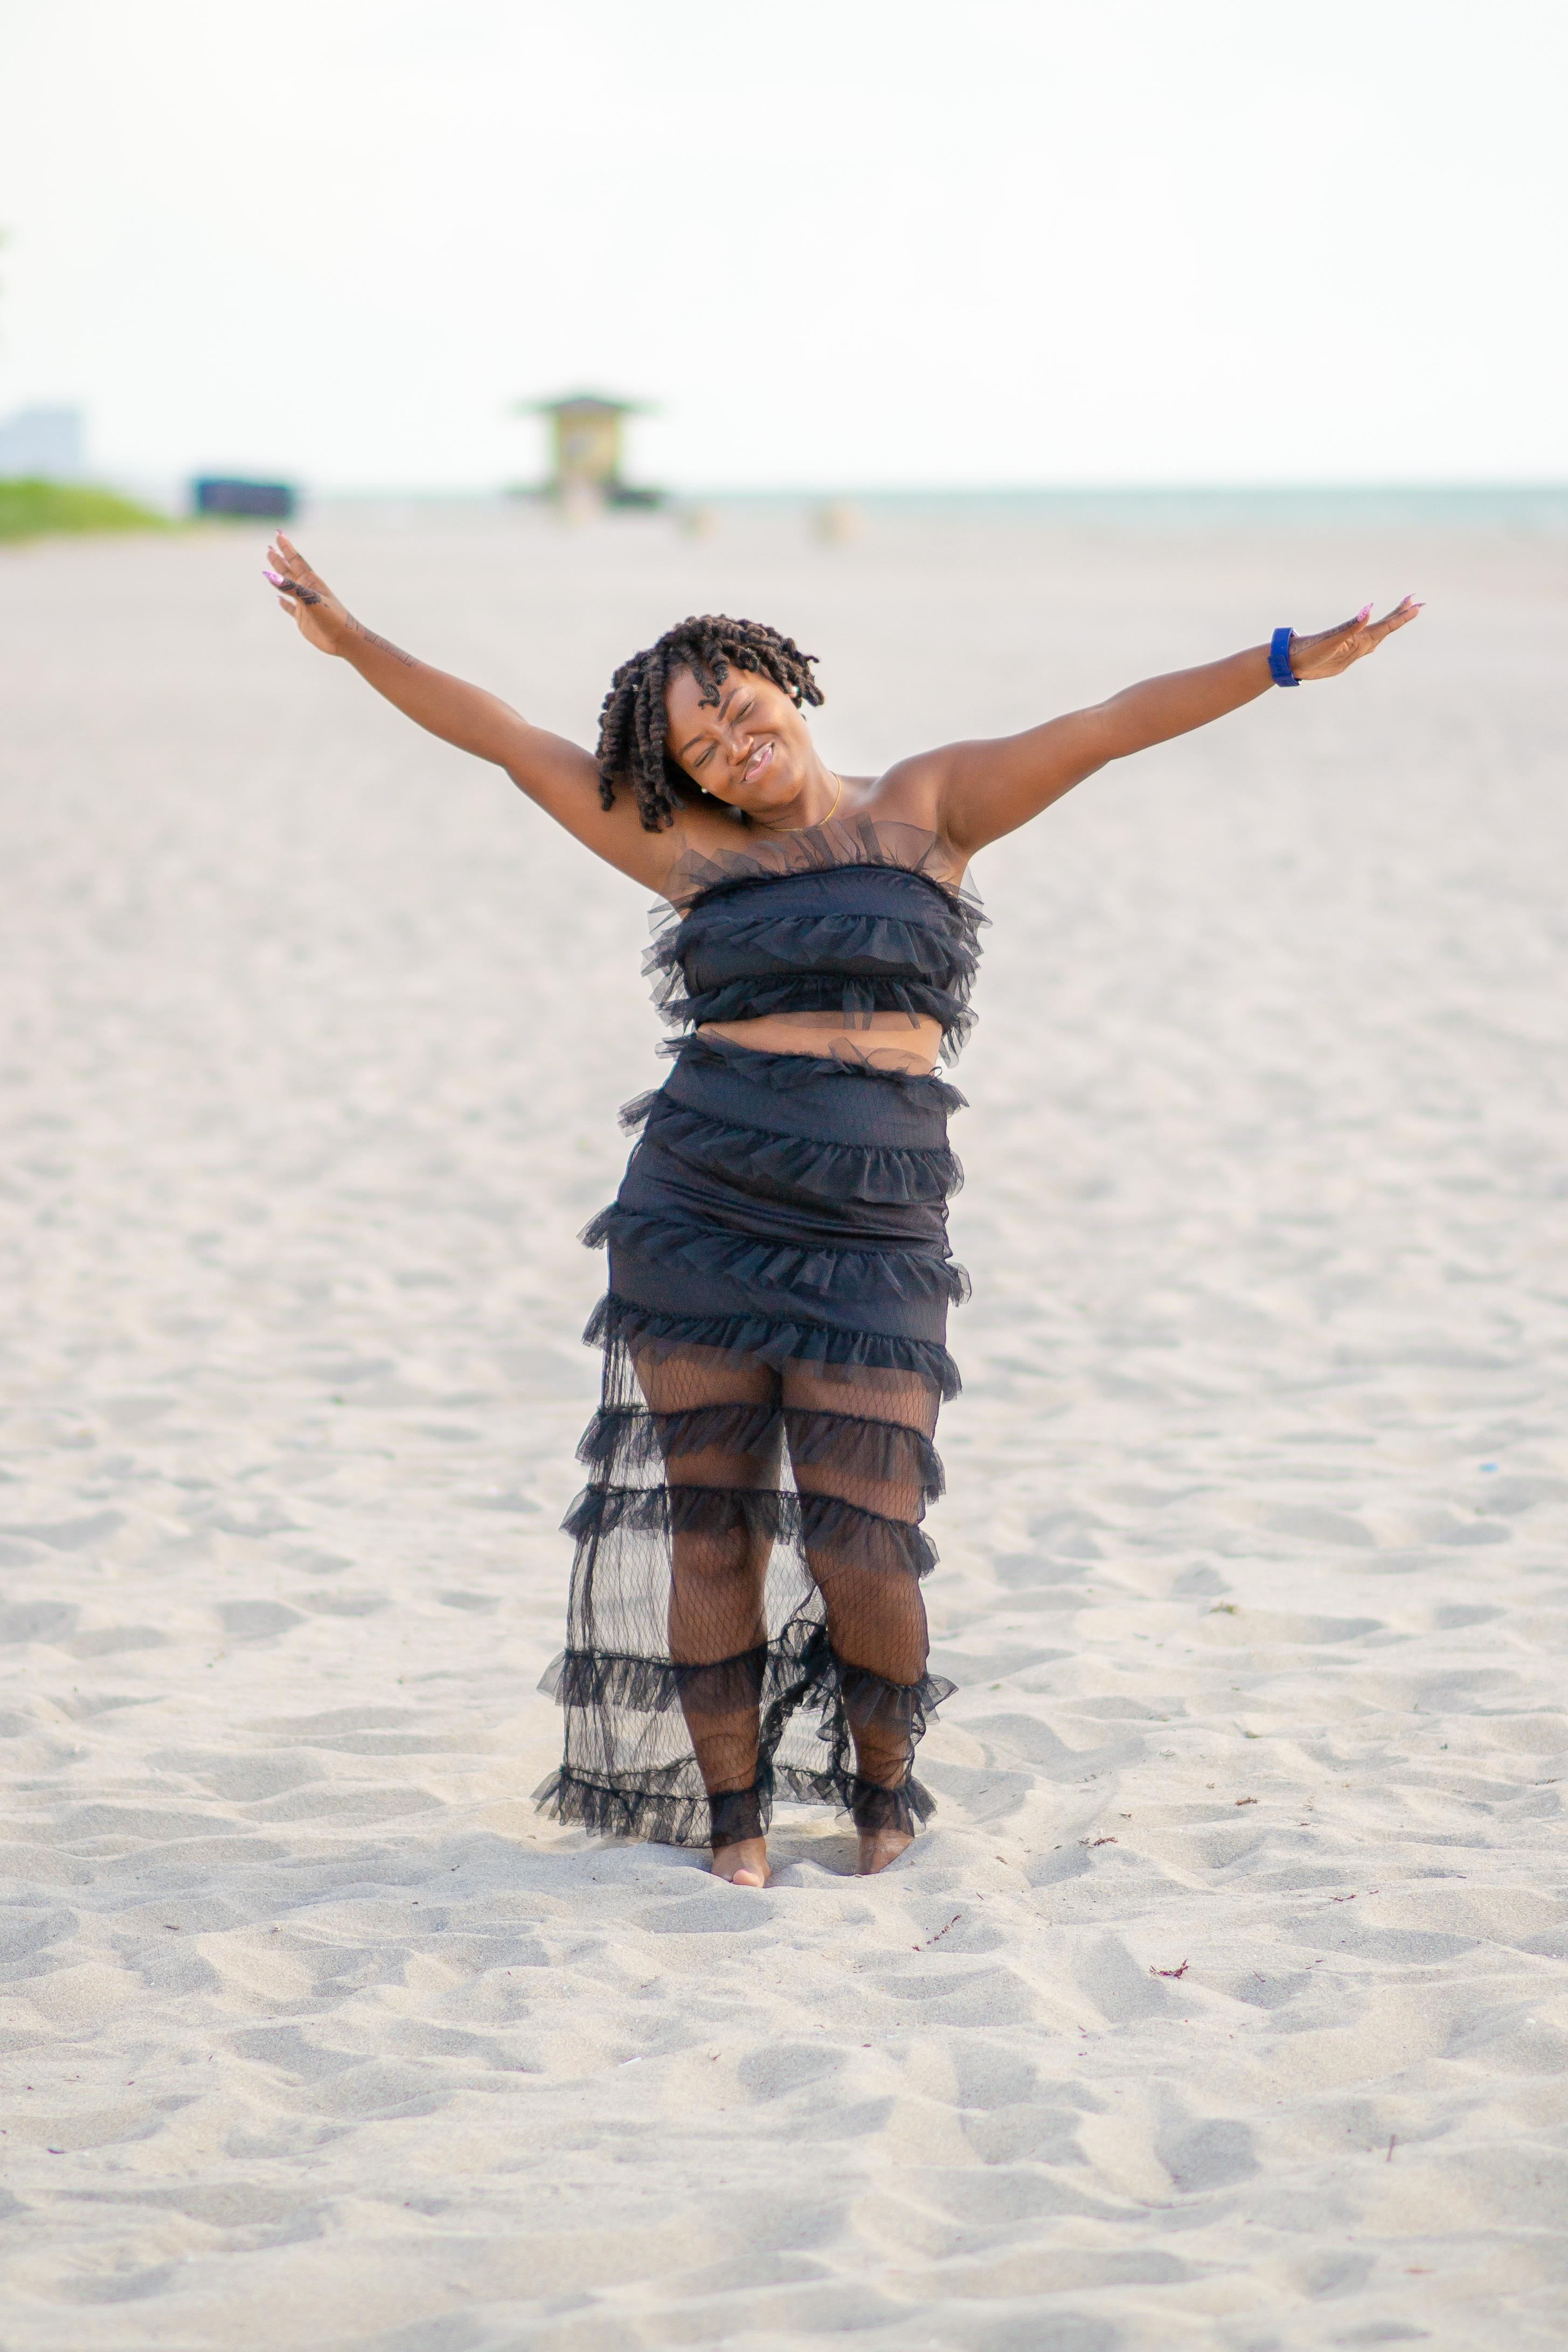 LAST SUMMER BEACH DAY- HOLLYWOOD BEACH, FL